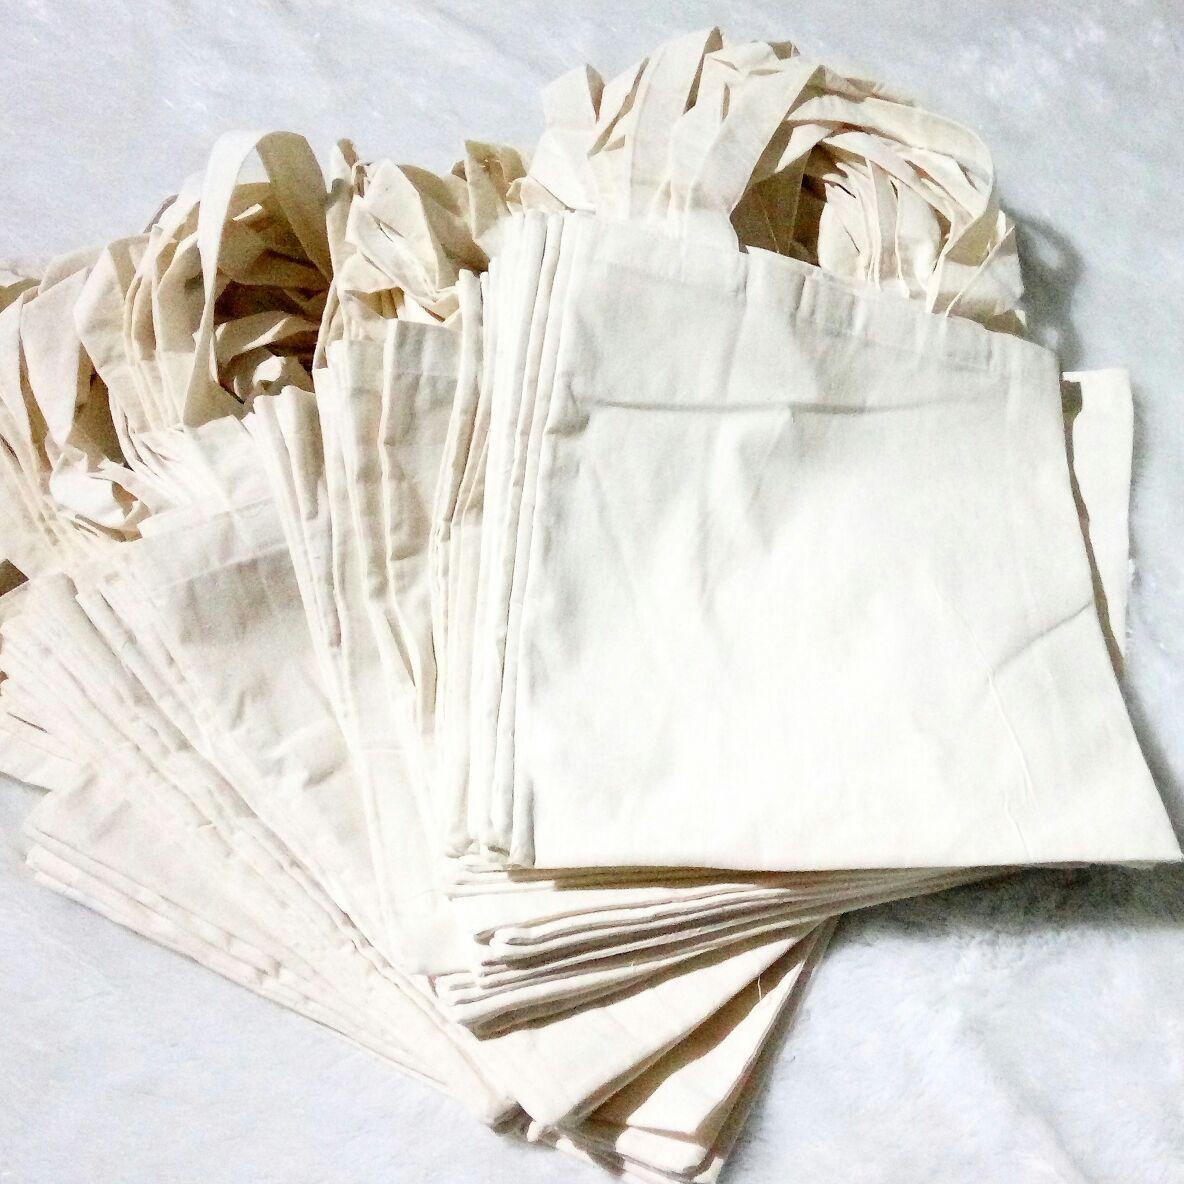 souvenir pernikahan murah, Souvenir Tas Pernikahan, tas belanja, Tas Blacu, tas blacu polos grosir